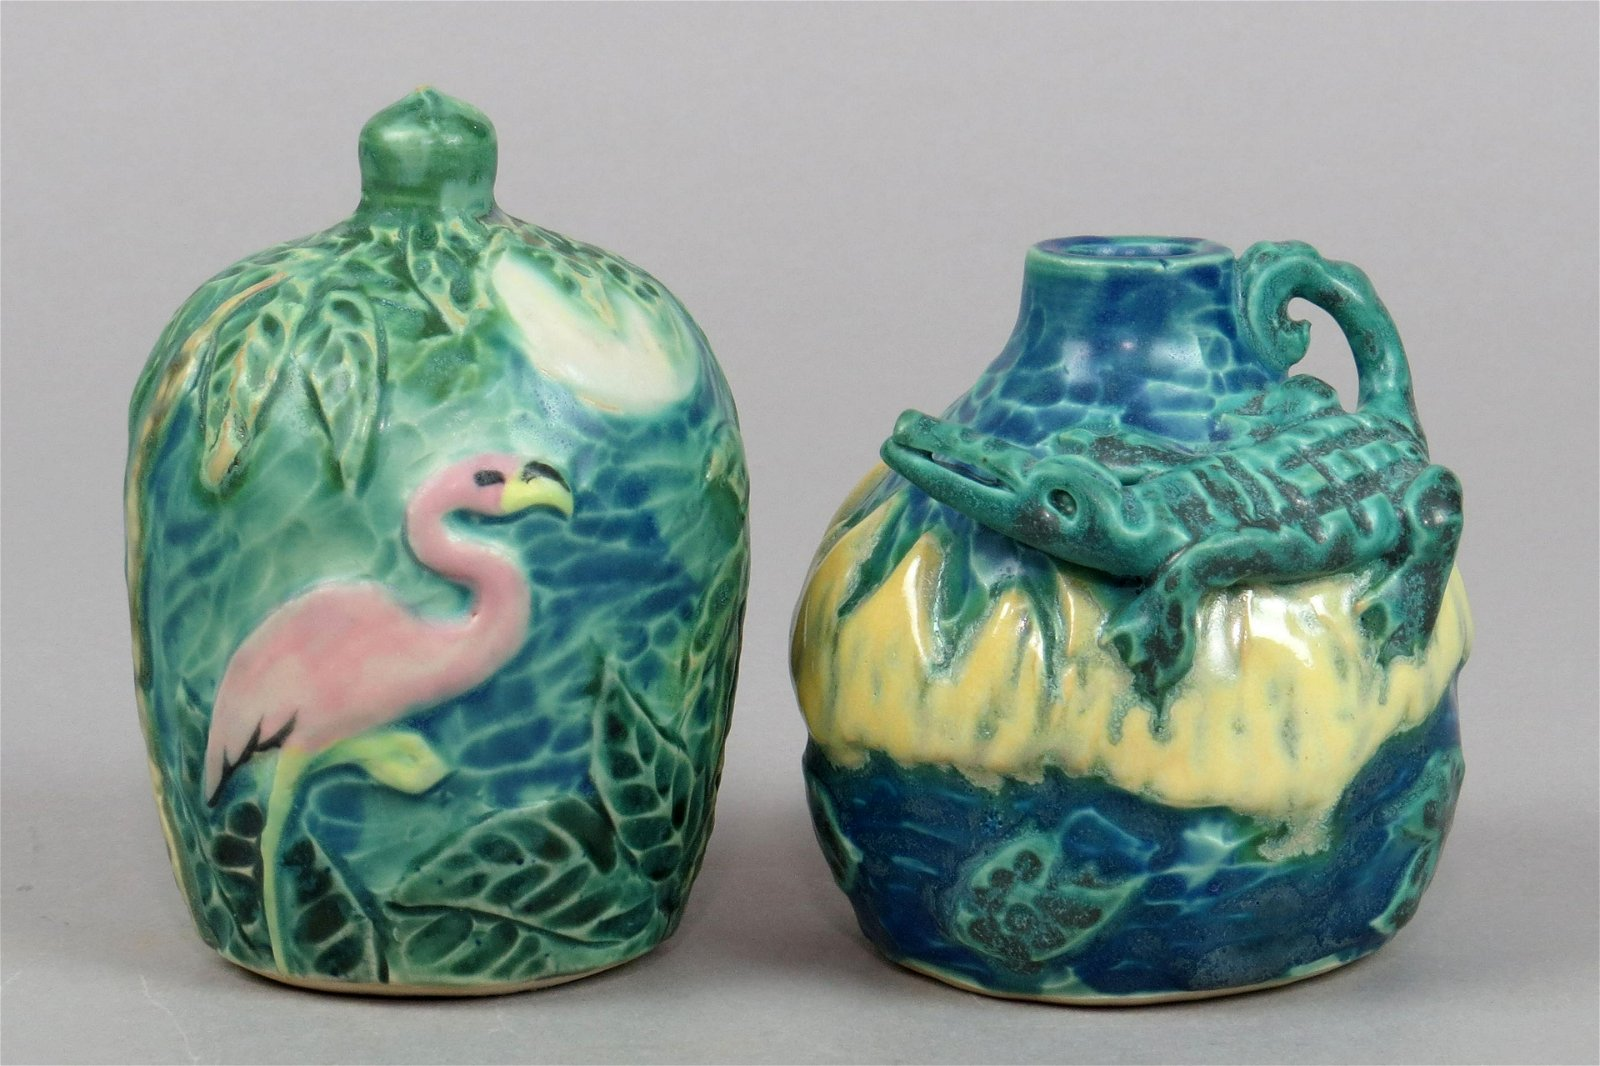 Lot of 2 Ceramic Florida Themed Banks